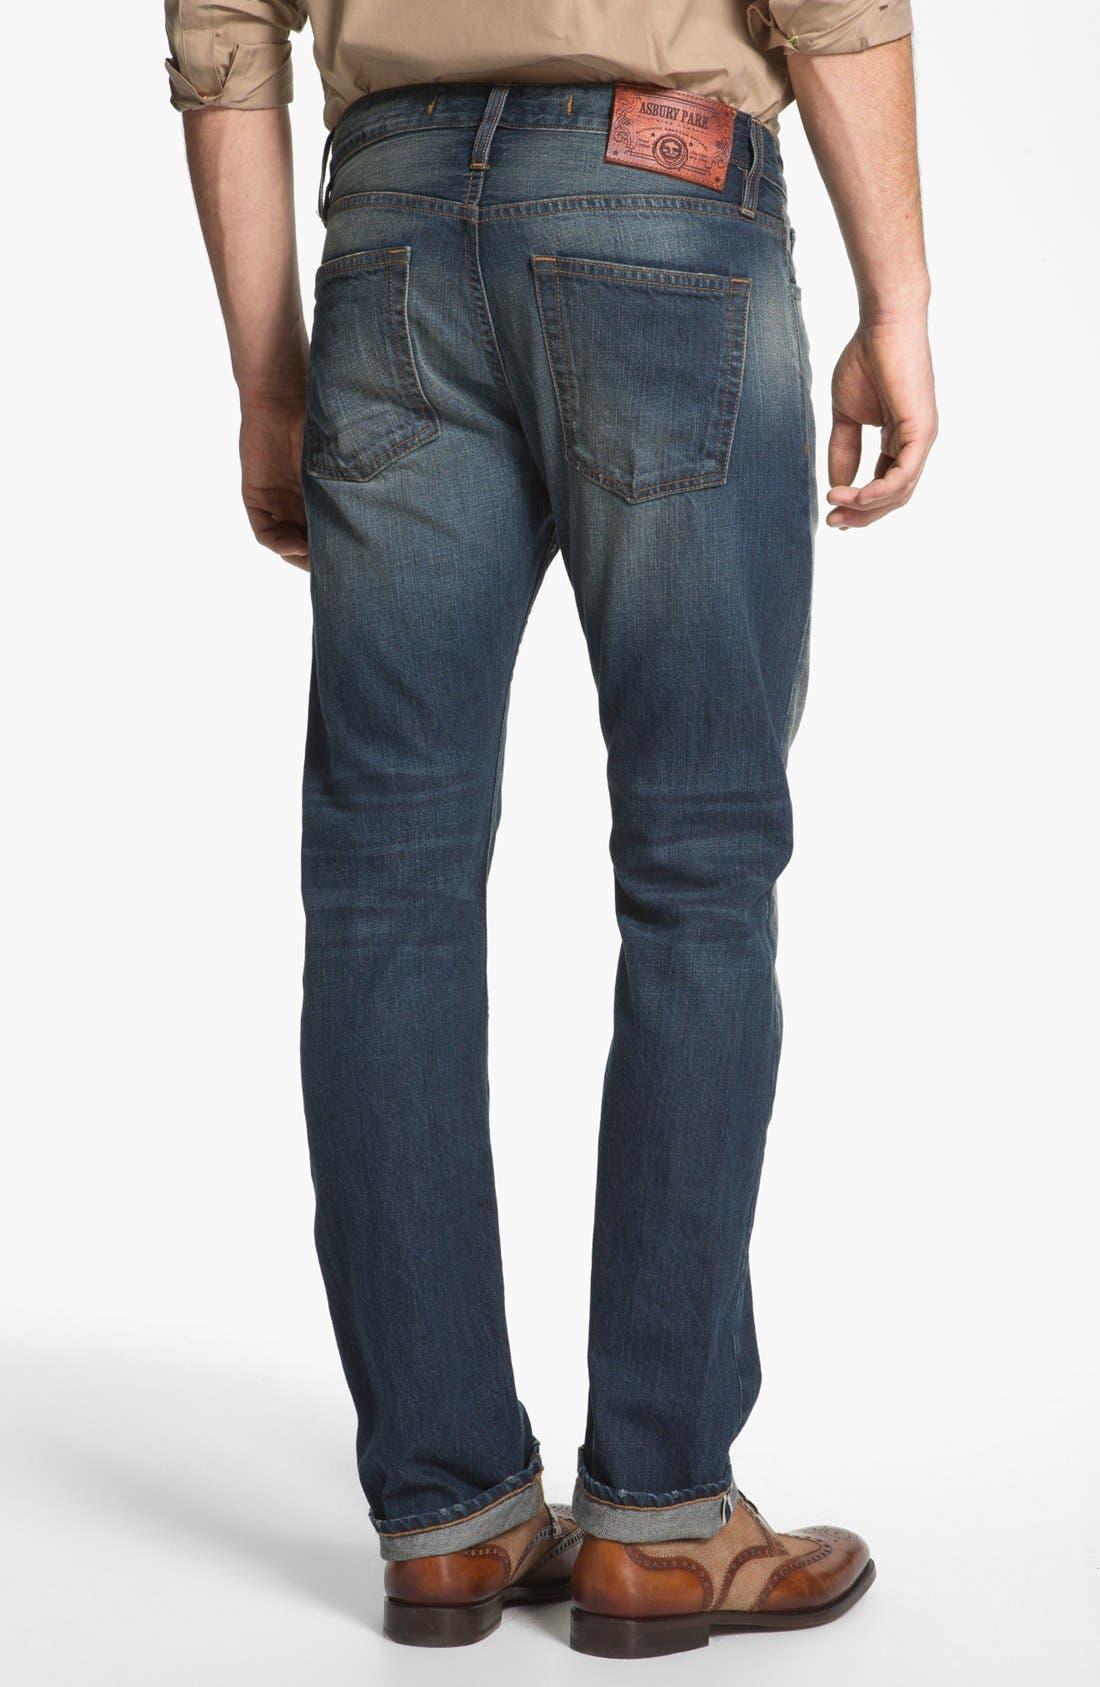 Alternate Image 2  - Asbury Park '1874 Monte Carlo' Straight Leg Selvedge Jeans (Harrison)